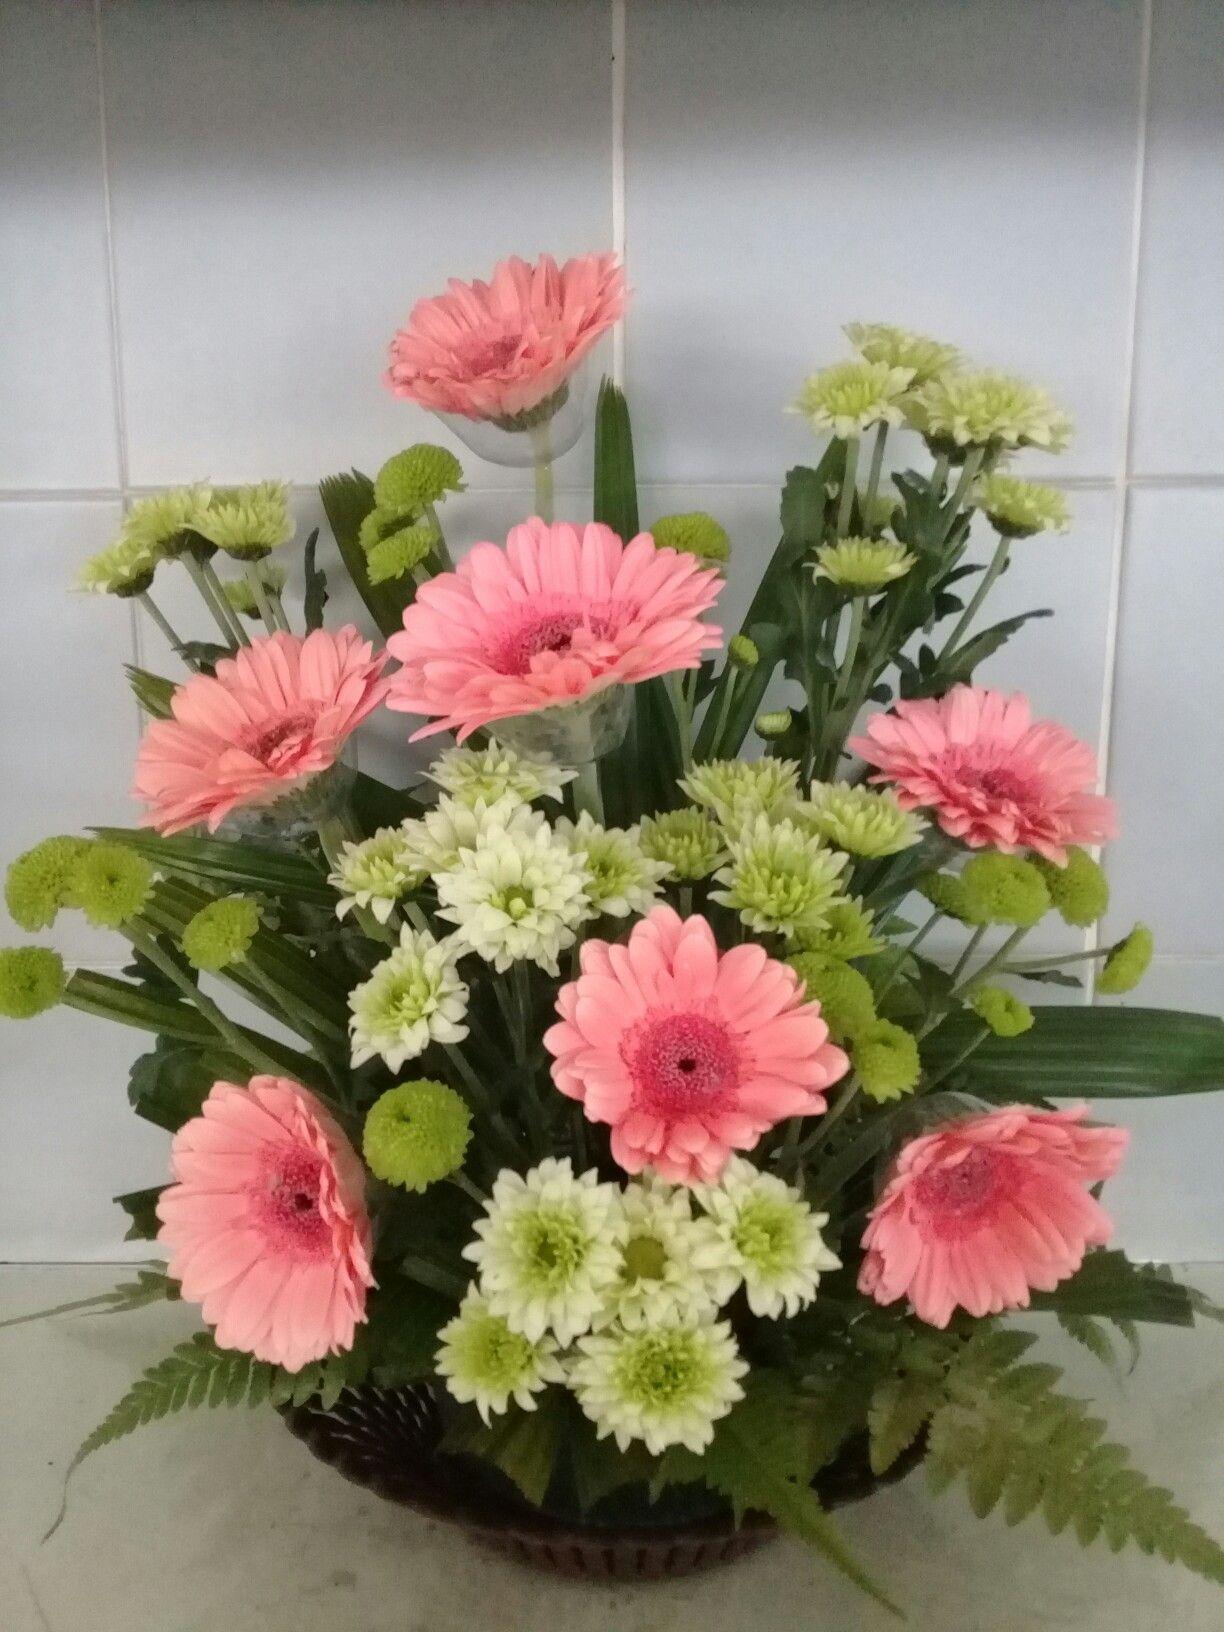 Pin by rosa soh on SEC flower arrangements | Pinterest | Flower ...